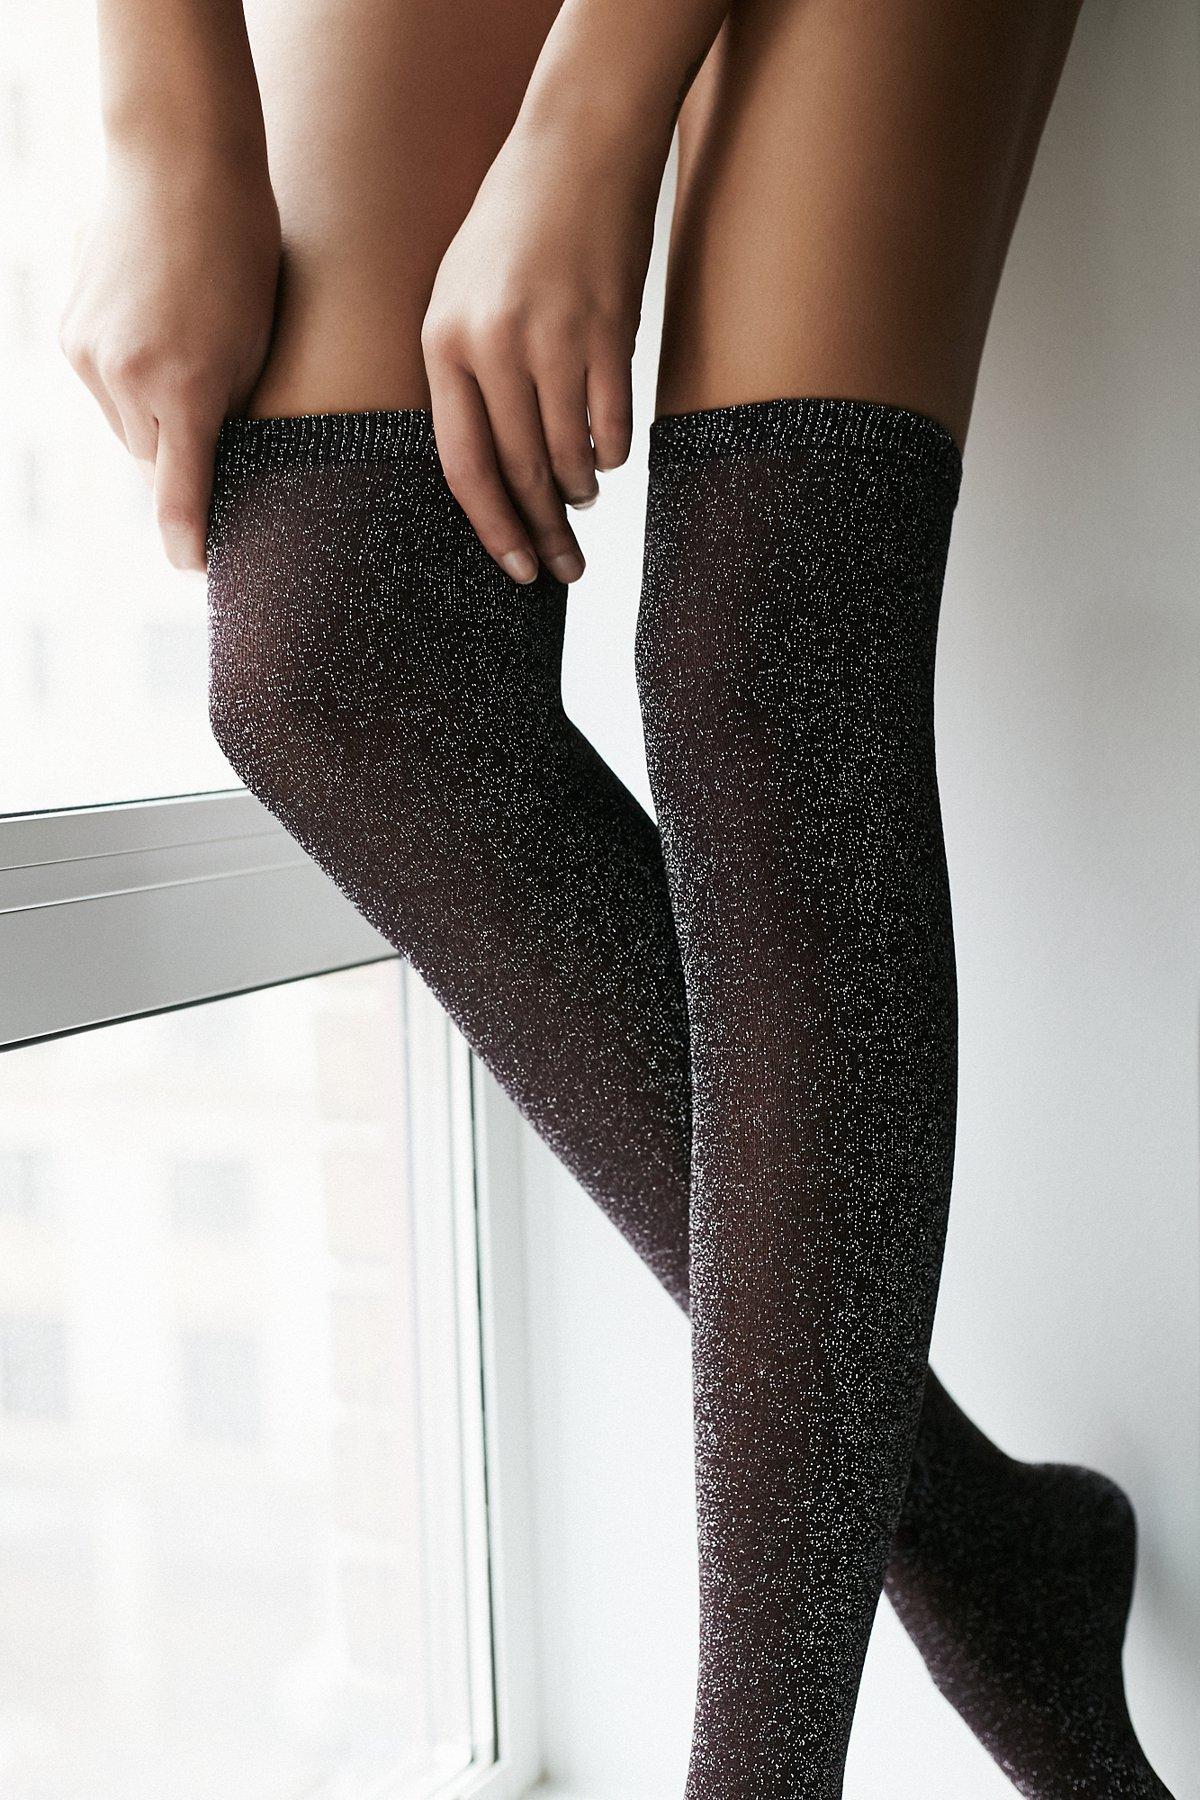 Tunnel Vision Knee Sock